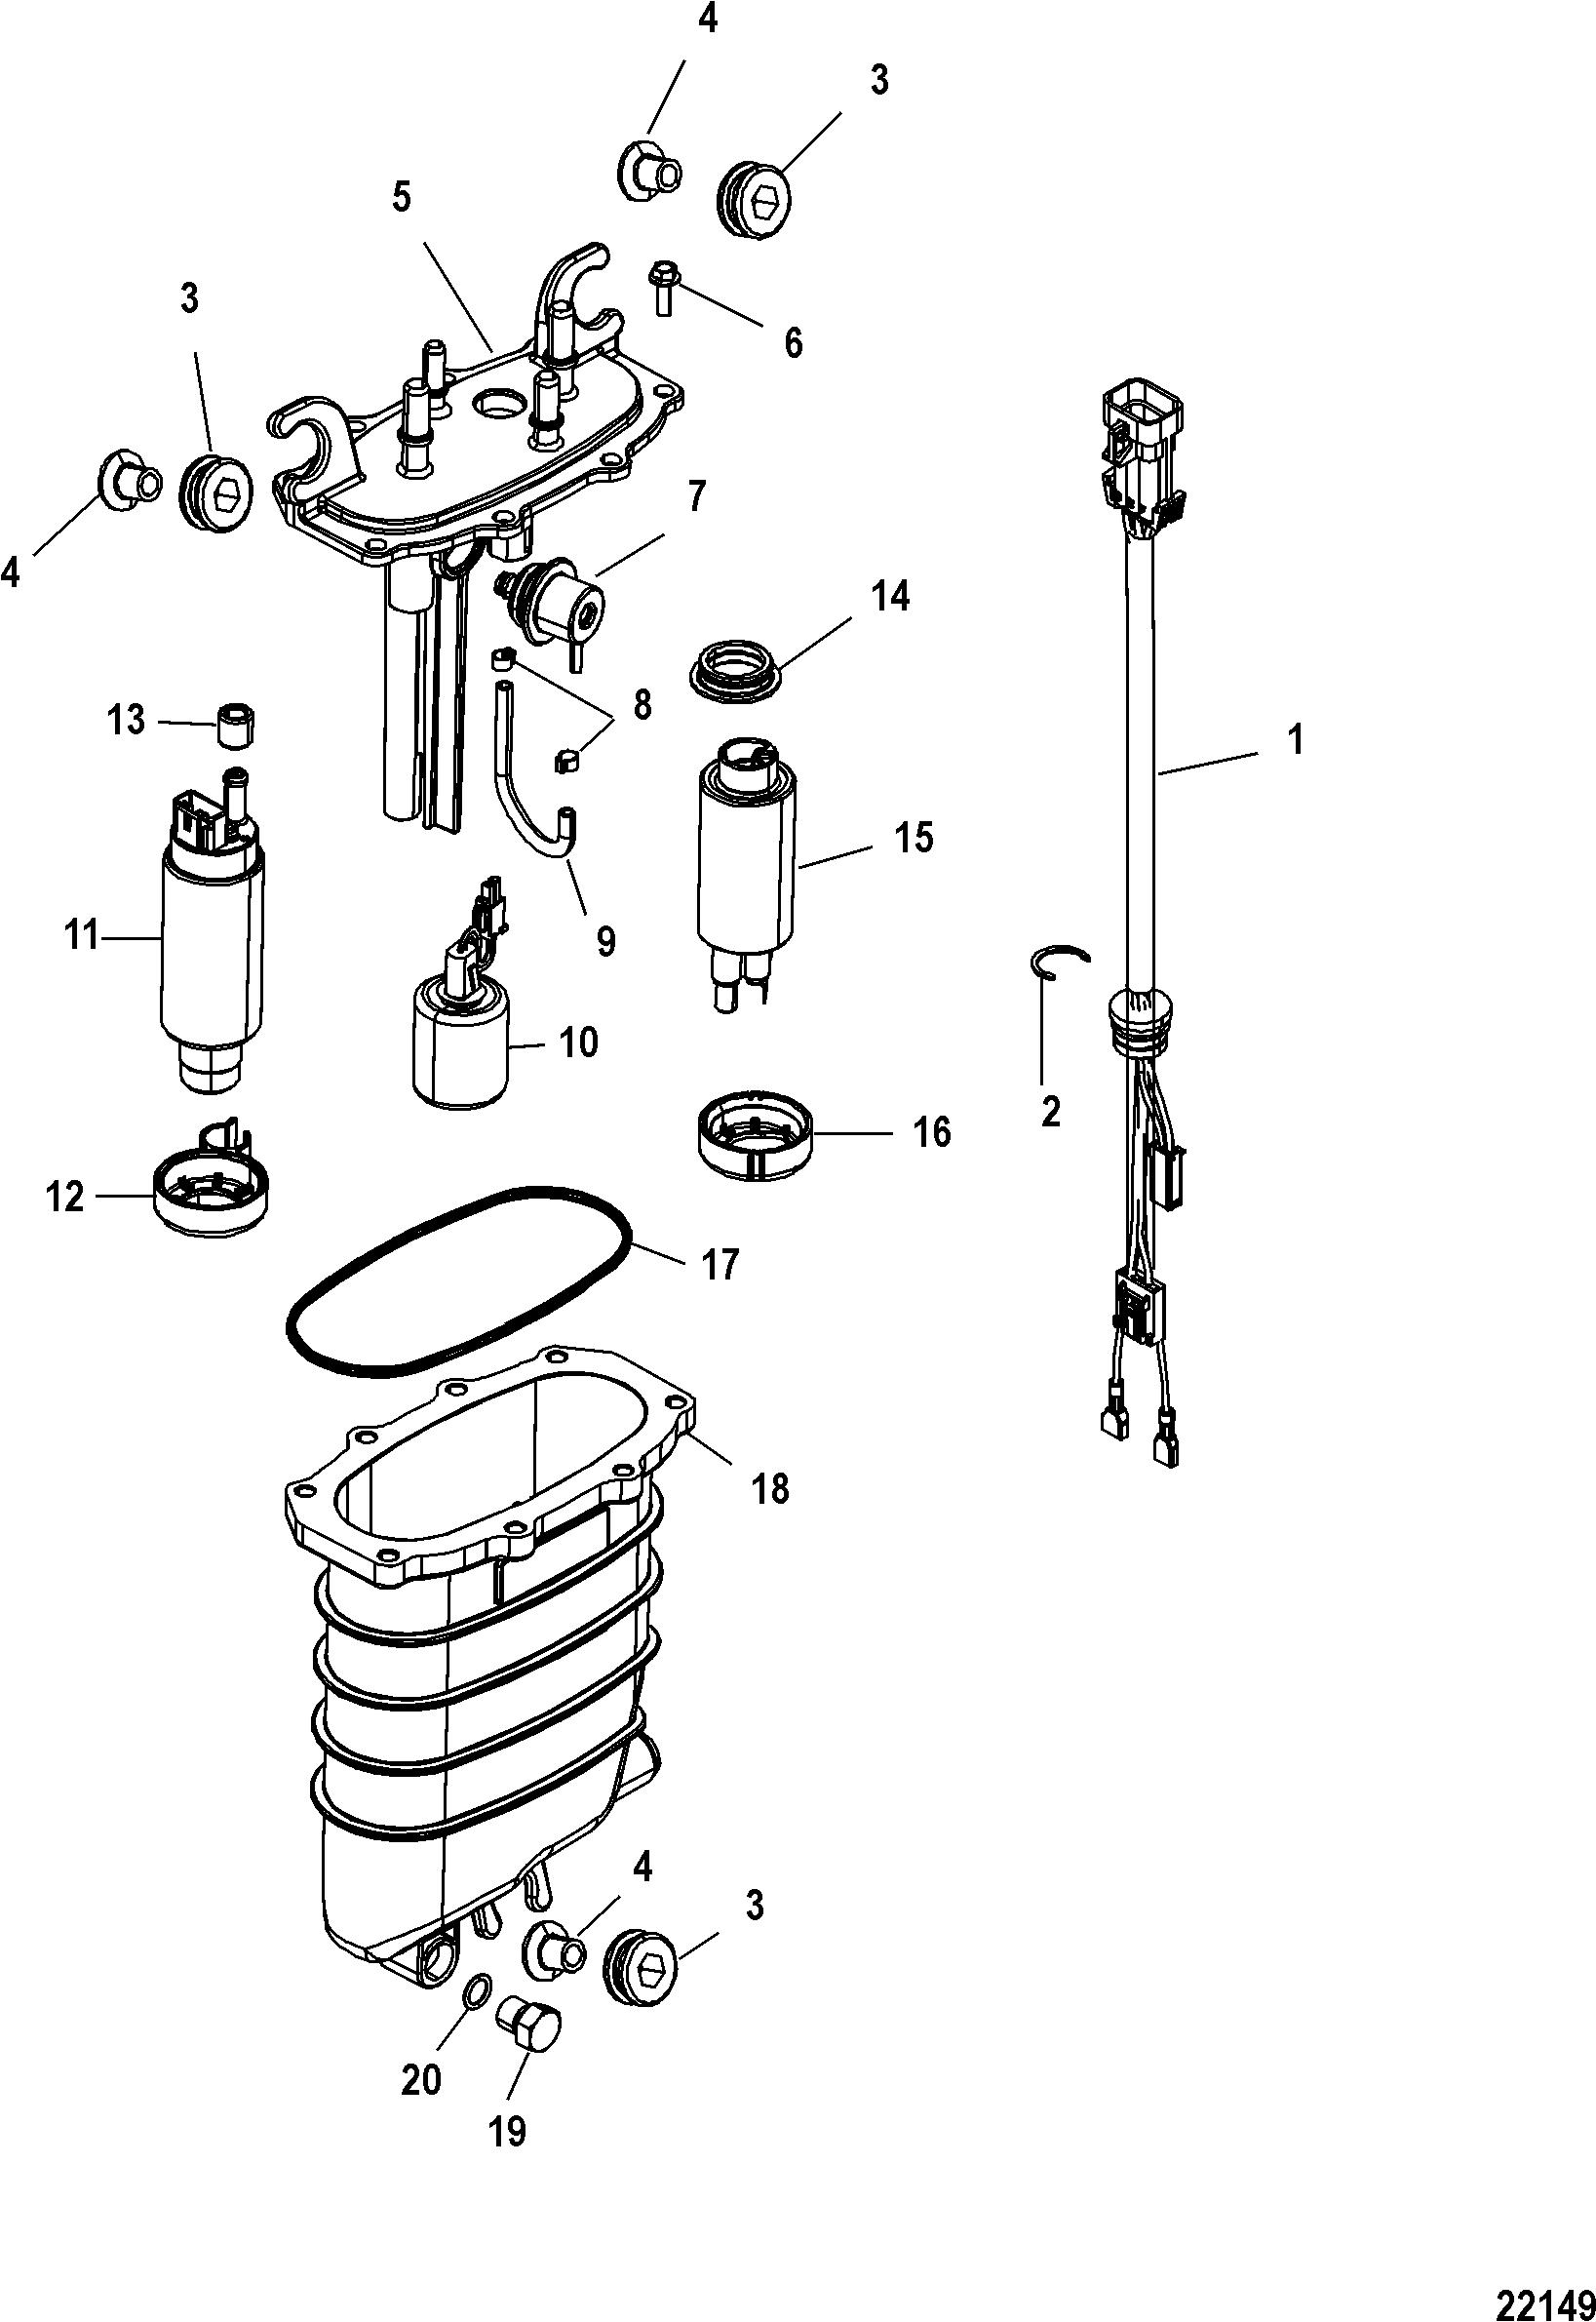 90 Hp Mercury Alarm Module Wiring Diagram